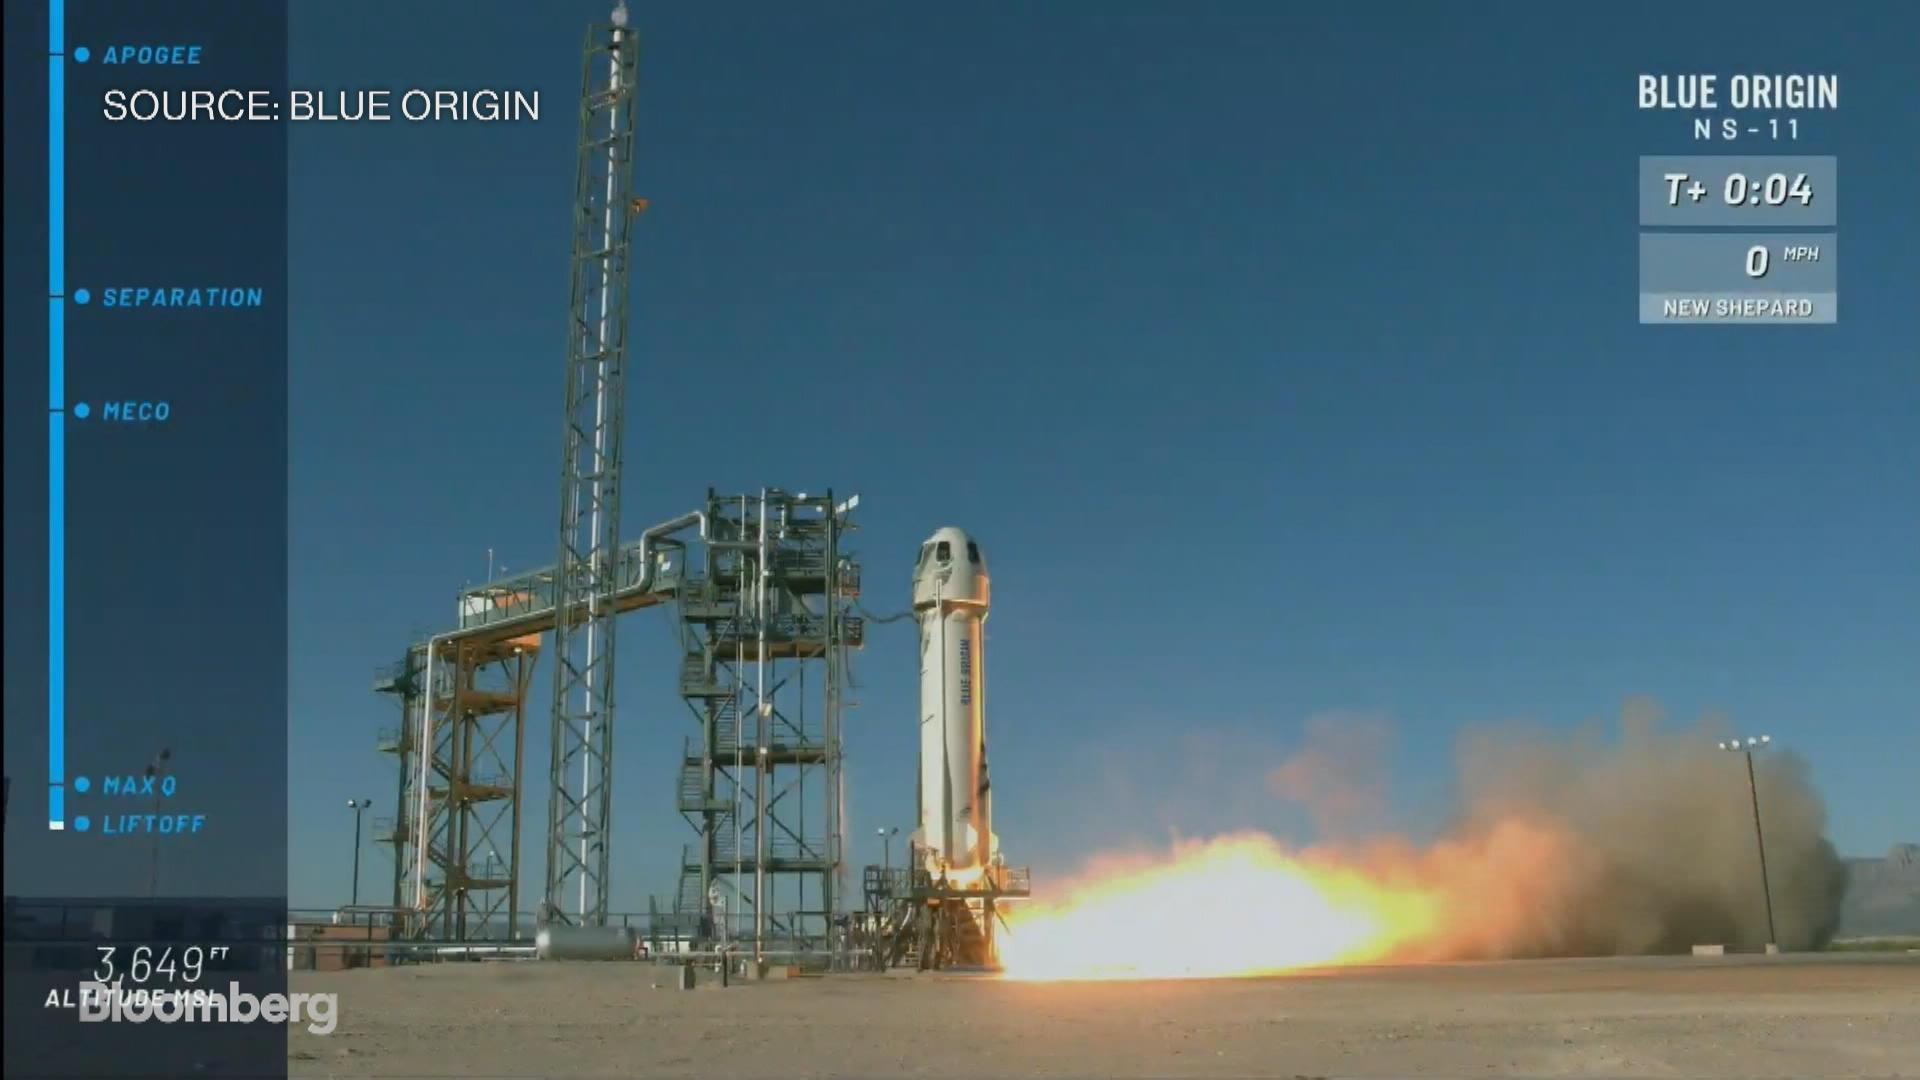 Bezos' Blue Origin Launches New Shepard Rocket